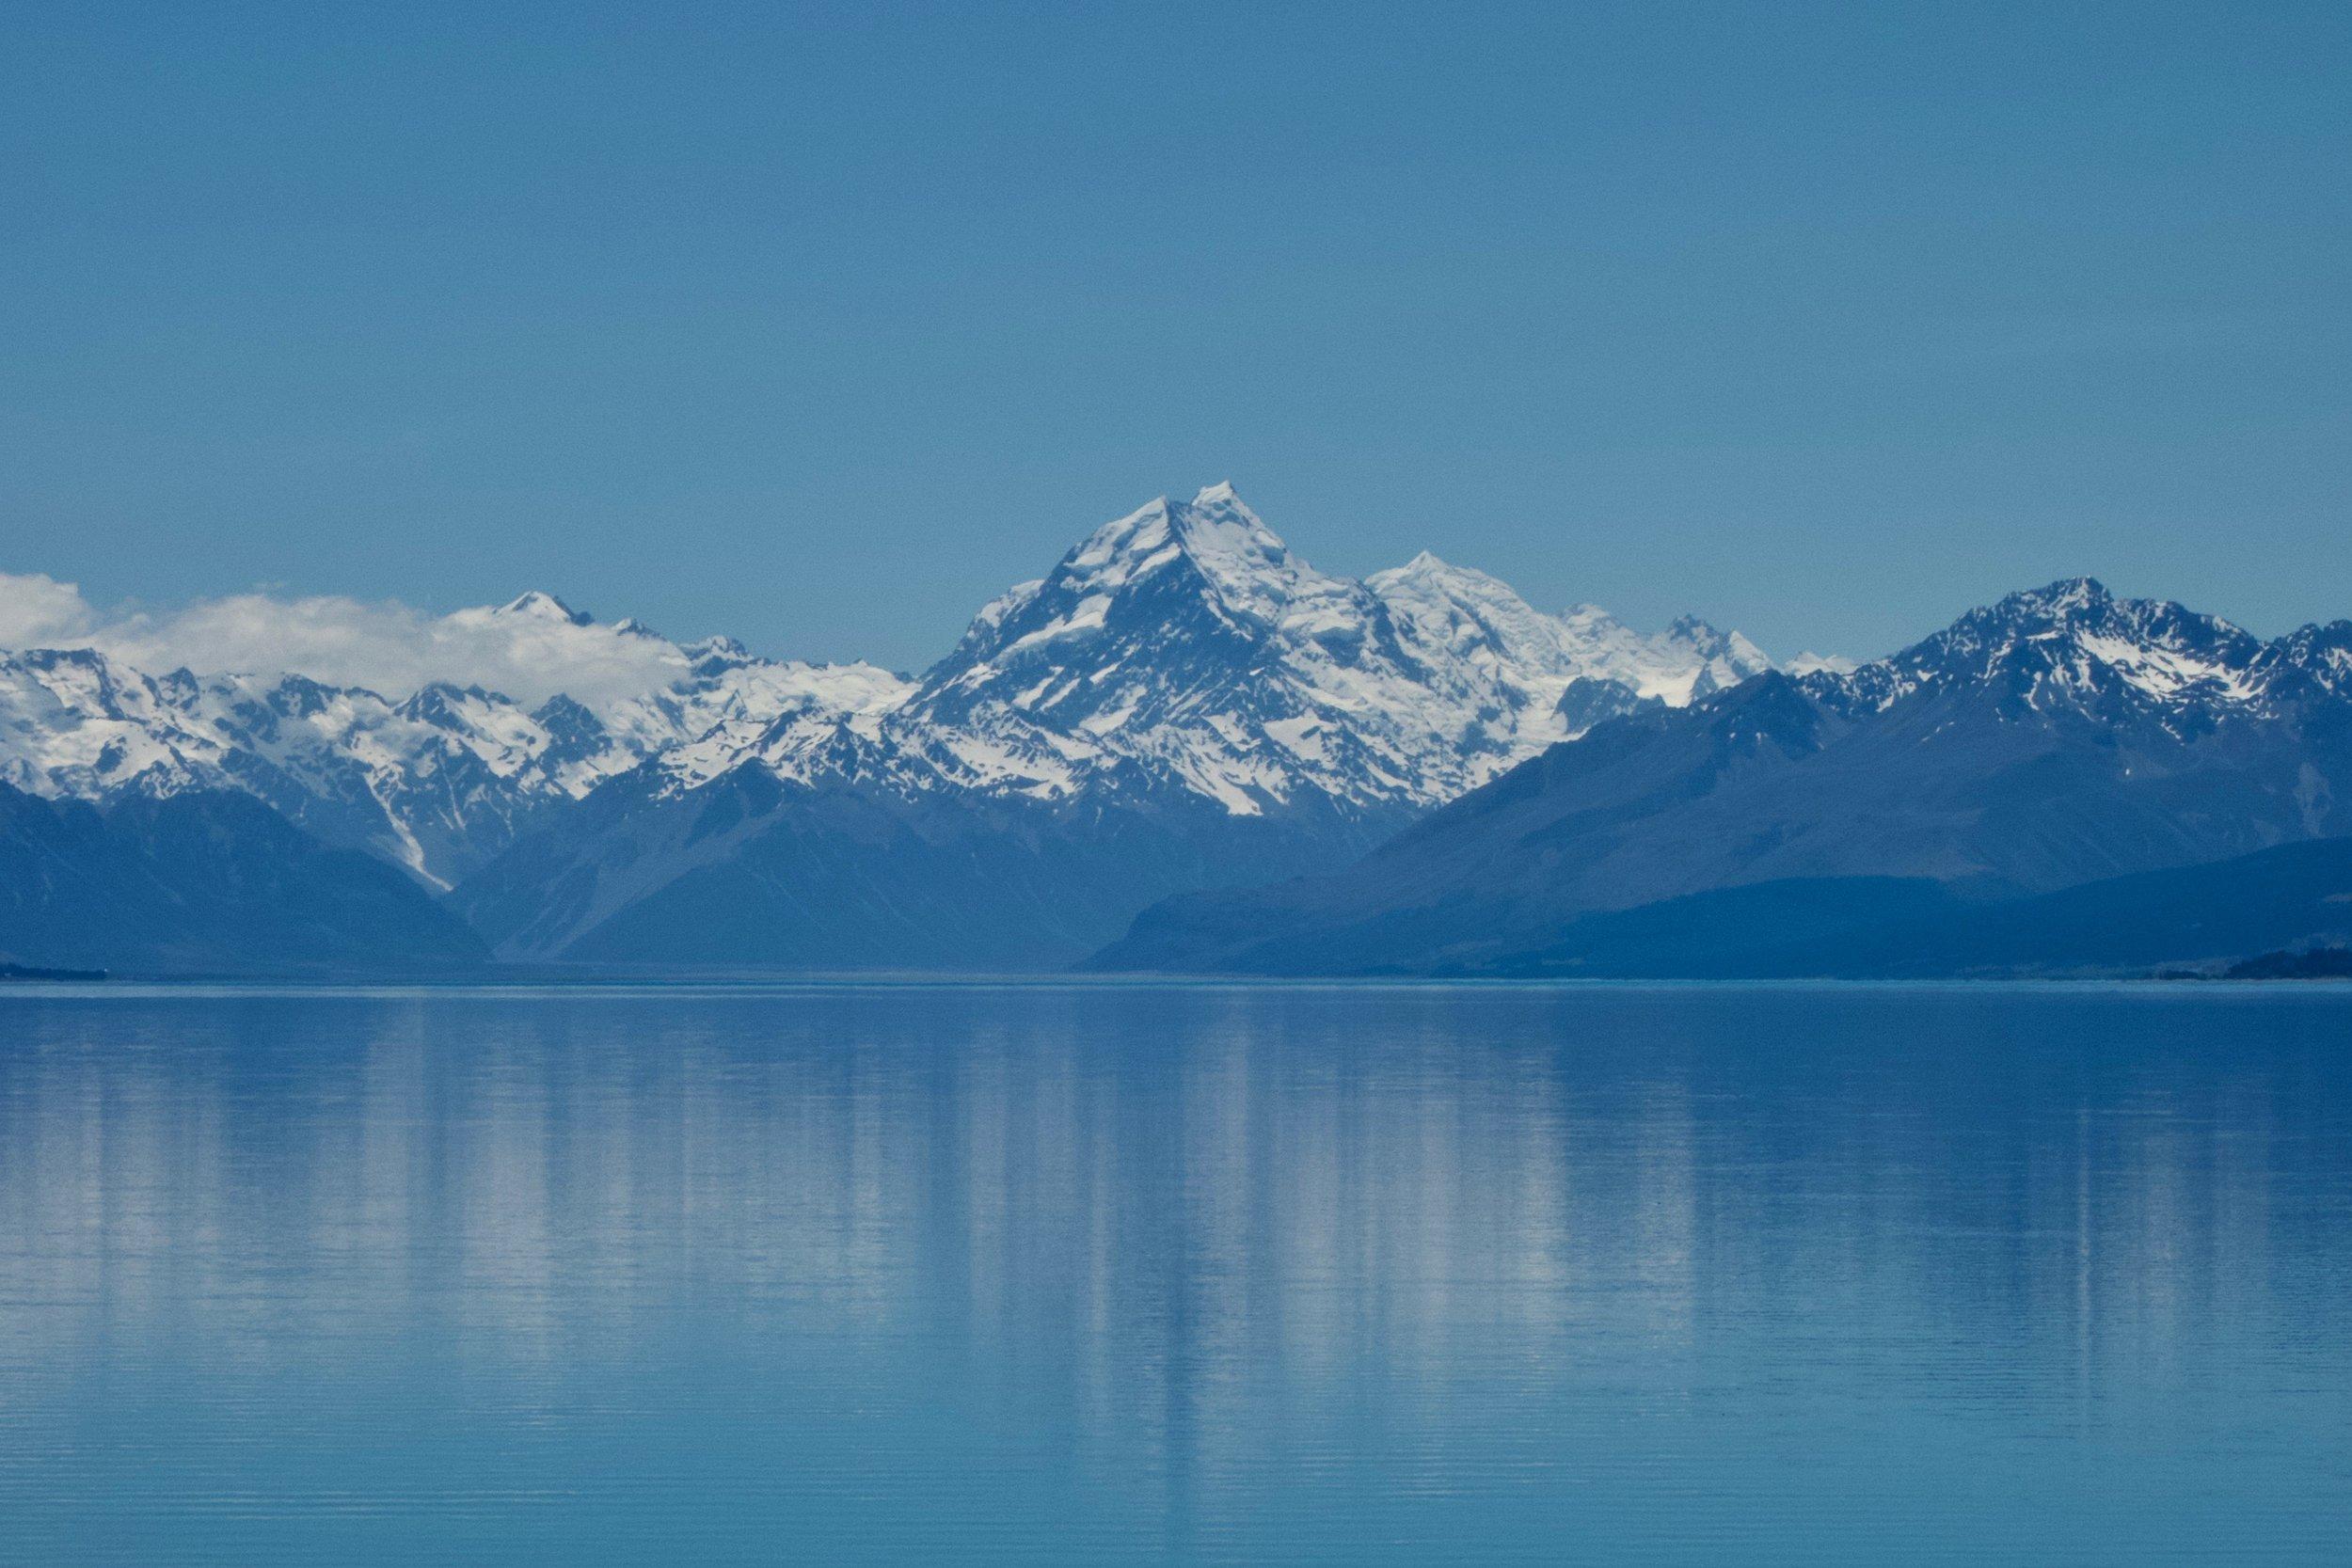 Aoraki Mount Cook across Lake Pukaki